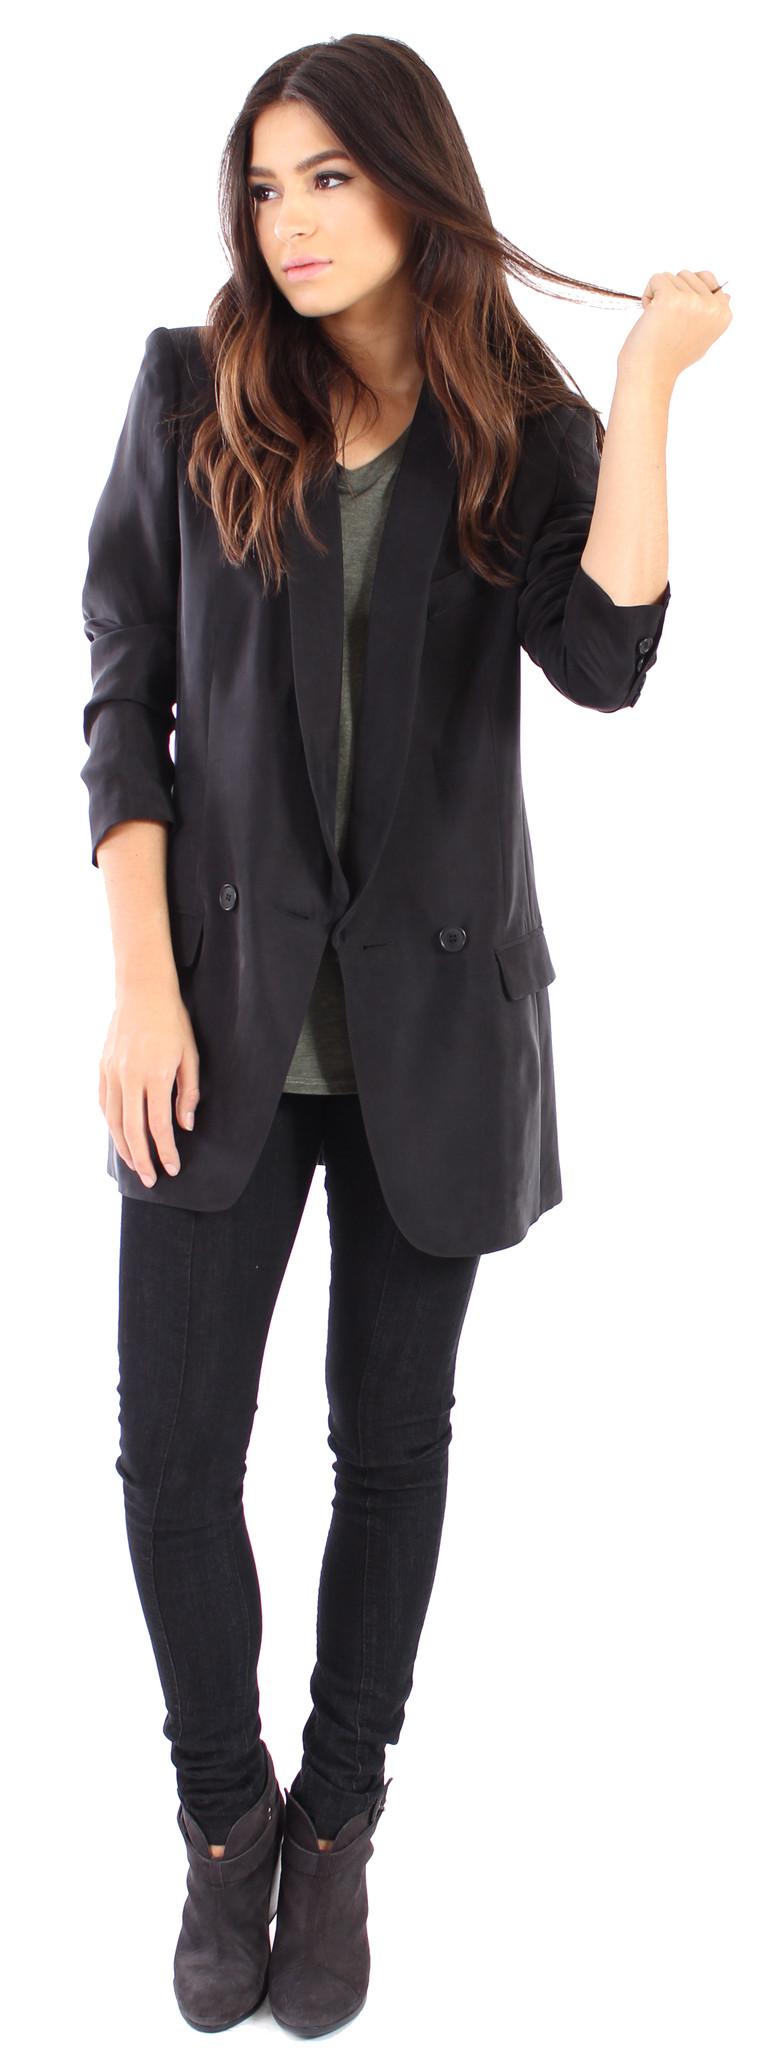 oversized boyfriend blazer from parallel garmentory. Black Bedroom Furniture Sets. Home Design Ideas